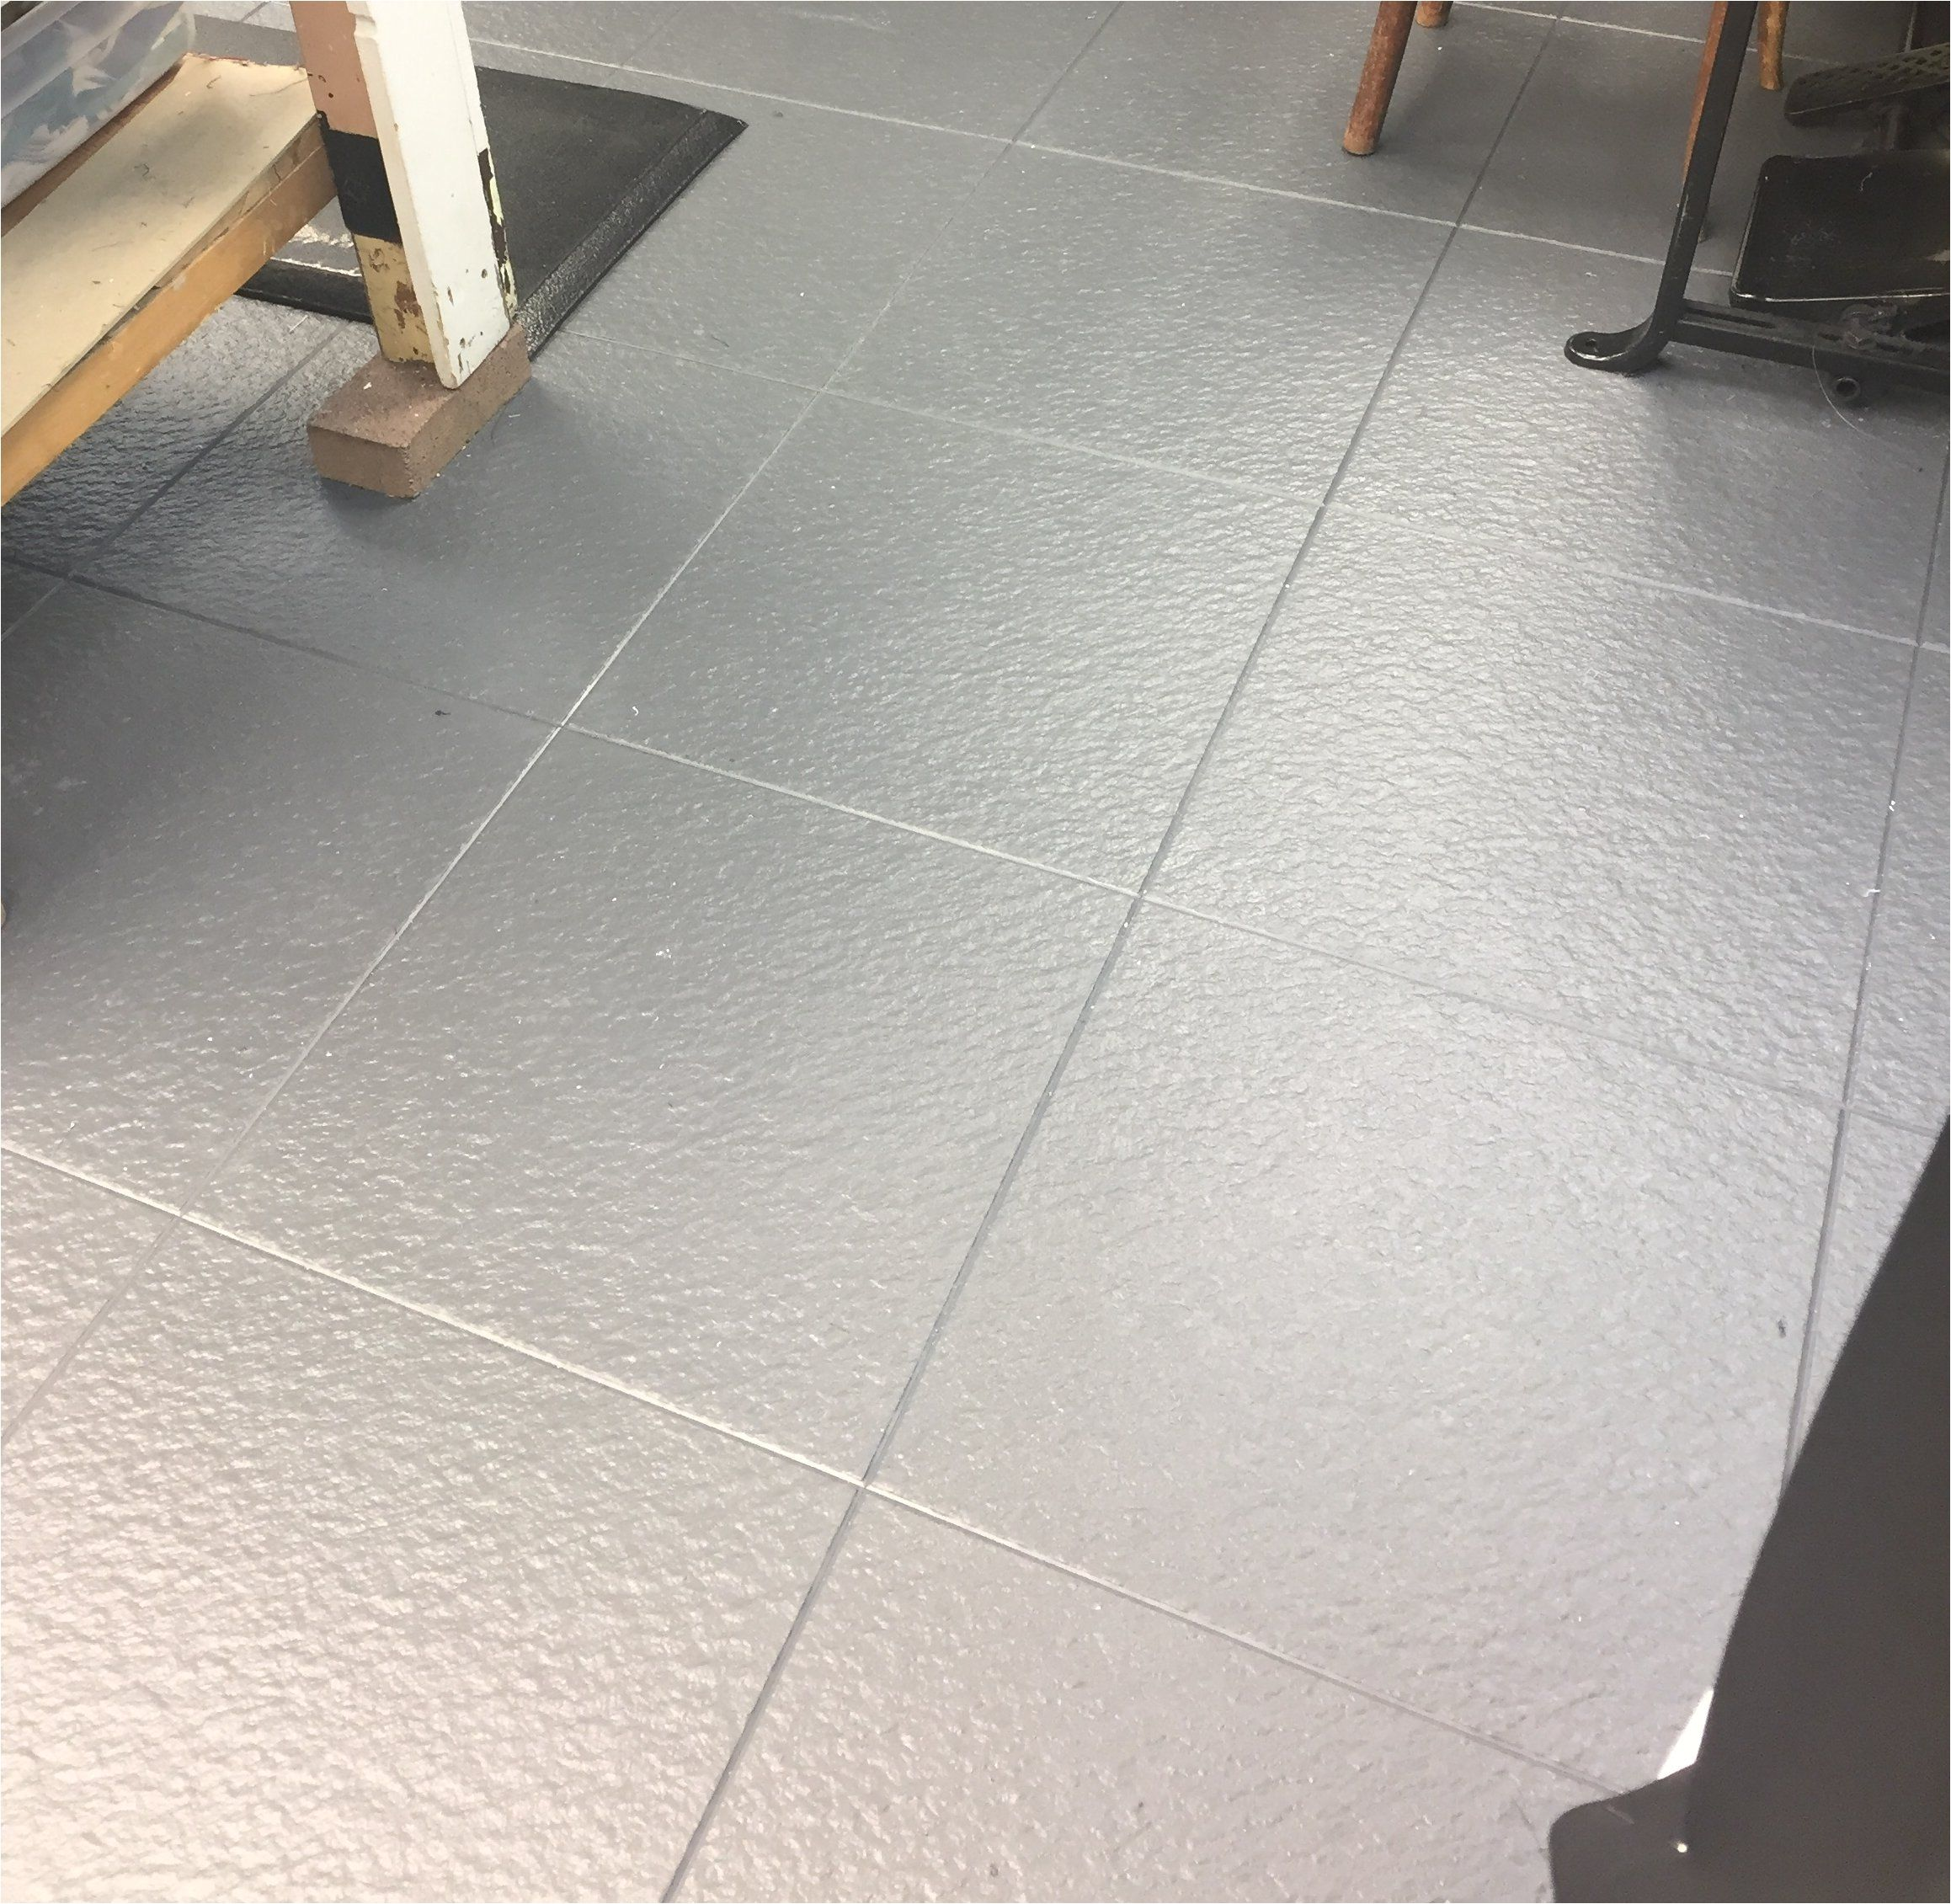 Rubber Flooring Tiles Uk Old Fashioned Garage Floor Tiles Rubber